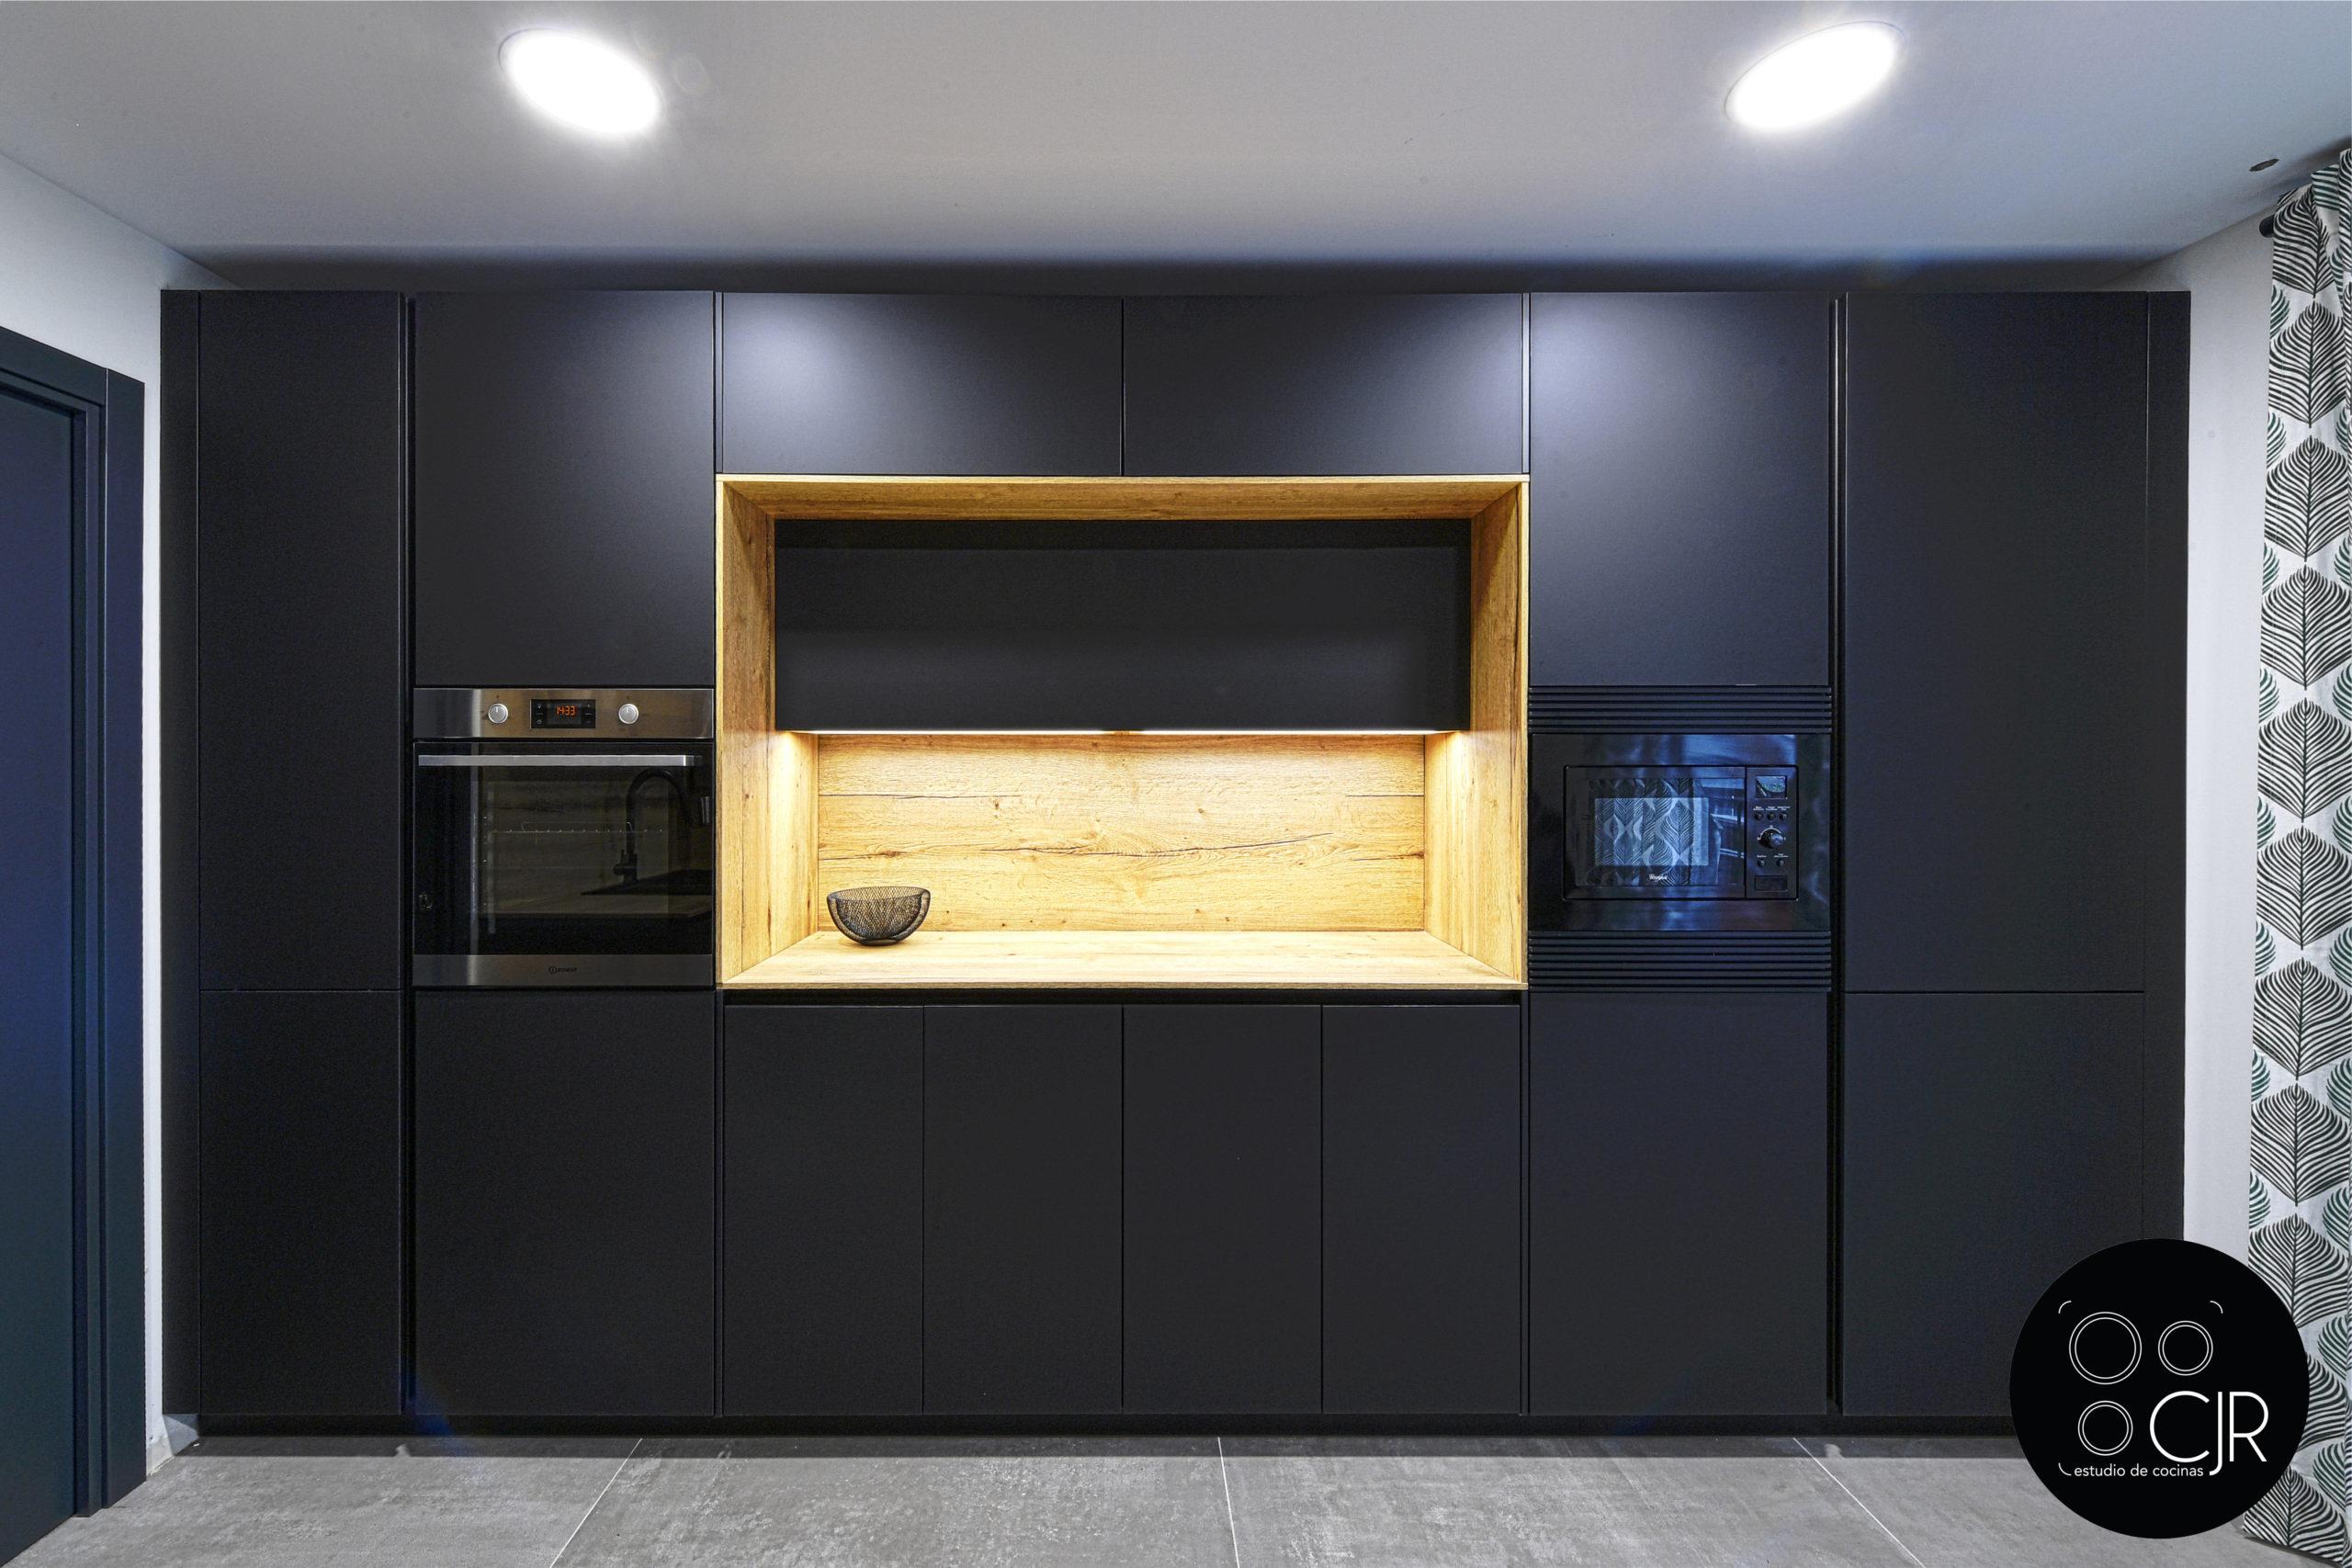 Vista frontal cocina negra mate y madera